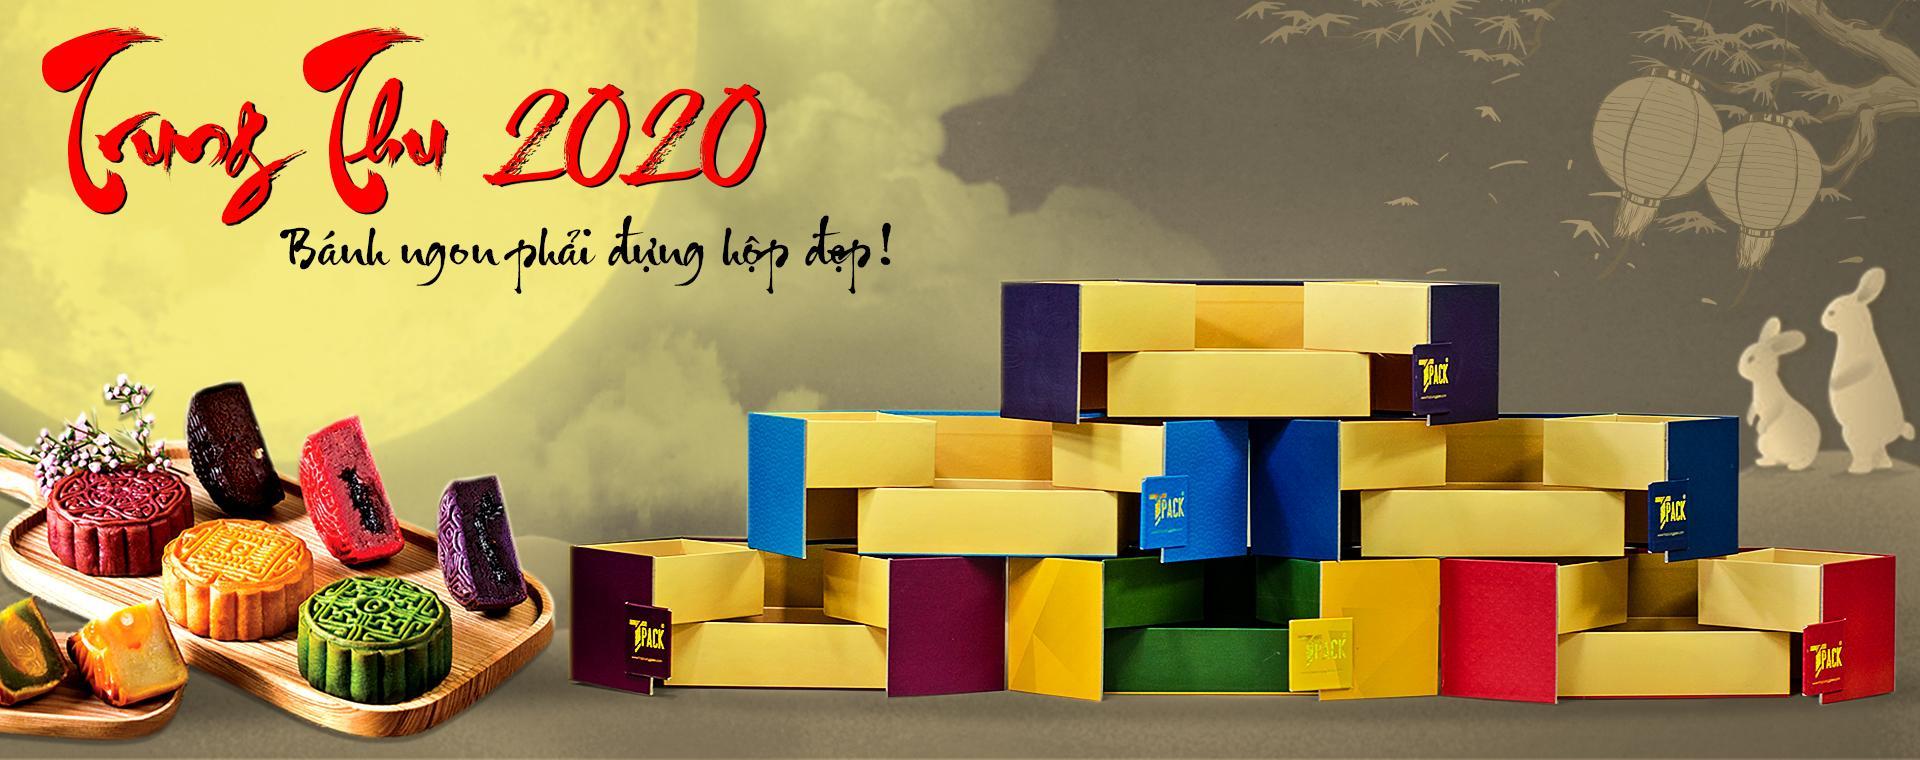 Hop banh trung thu dep 2020